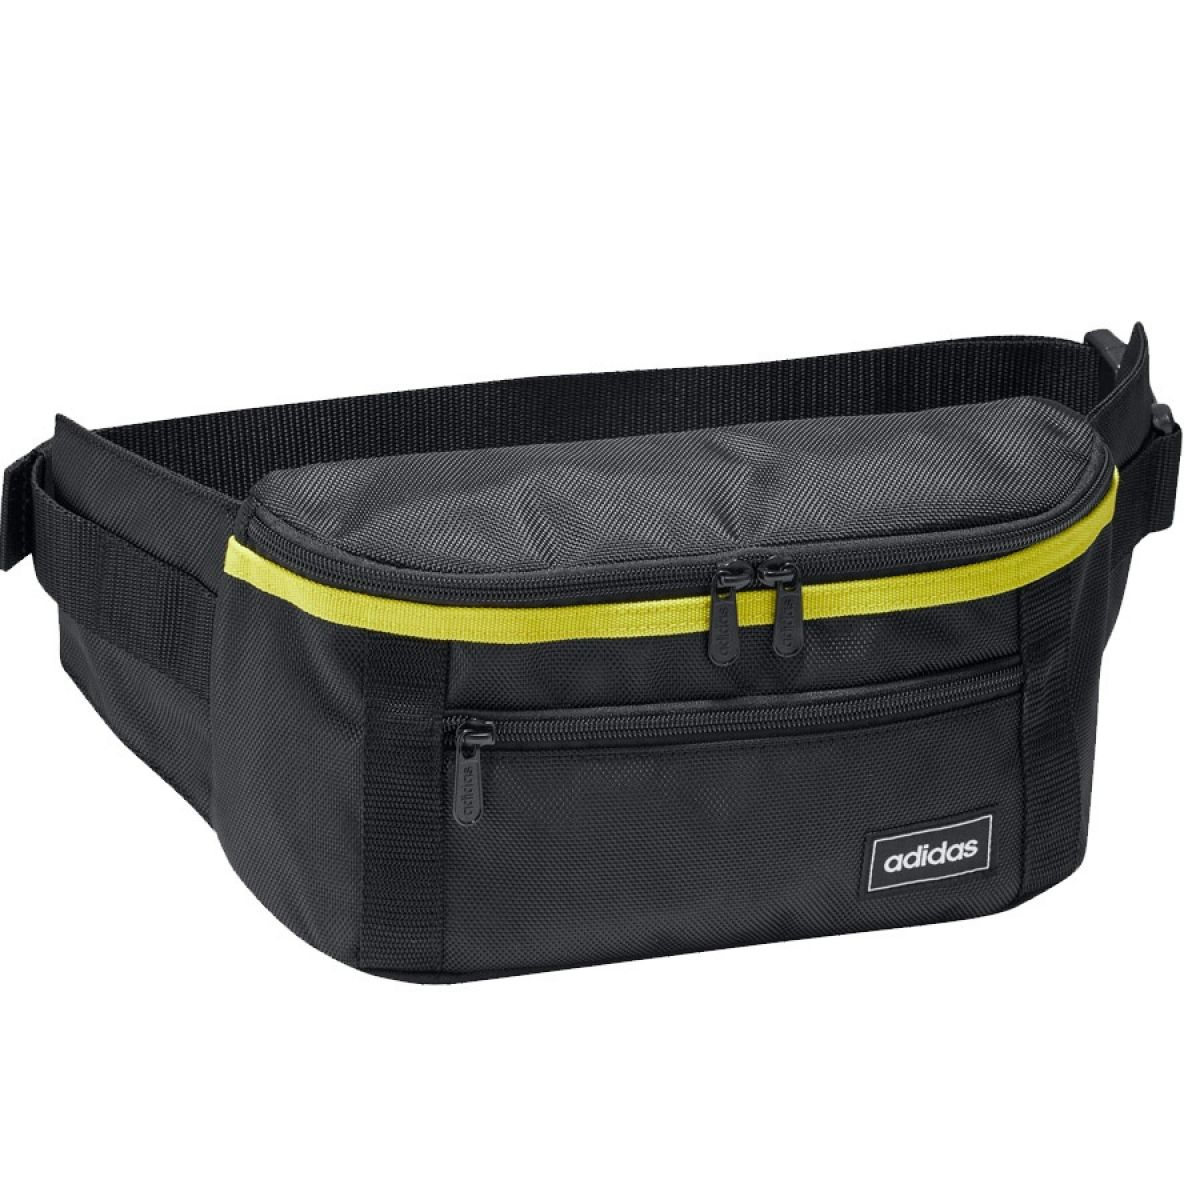 Adidas STR Waistbag